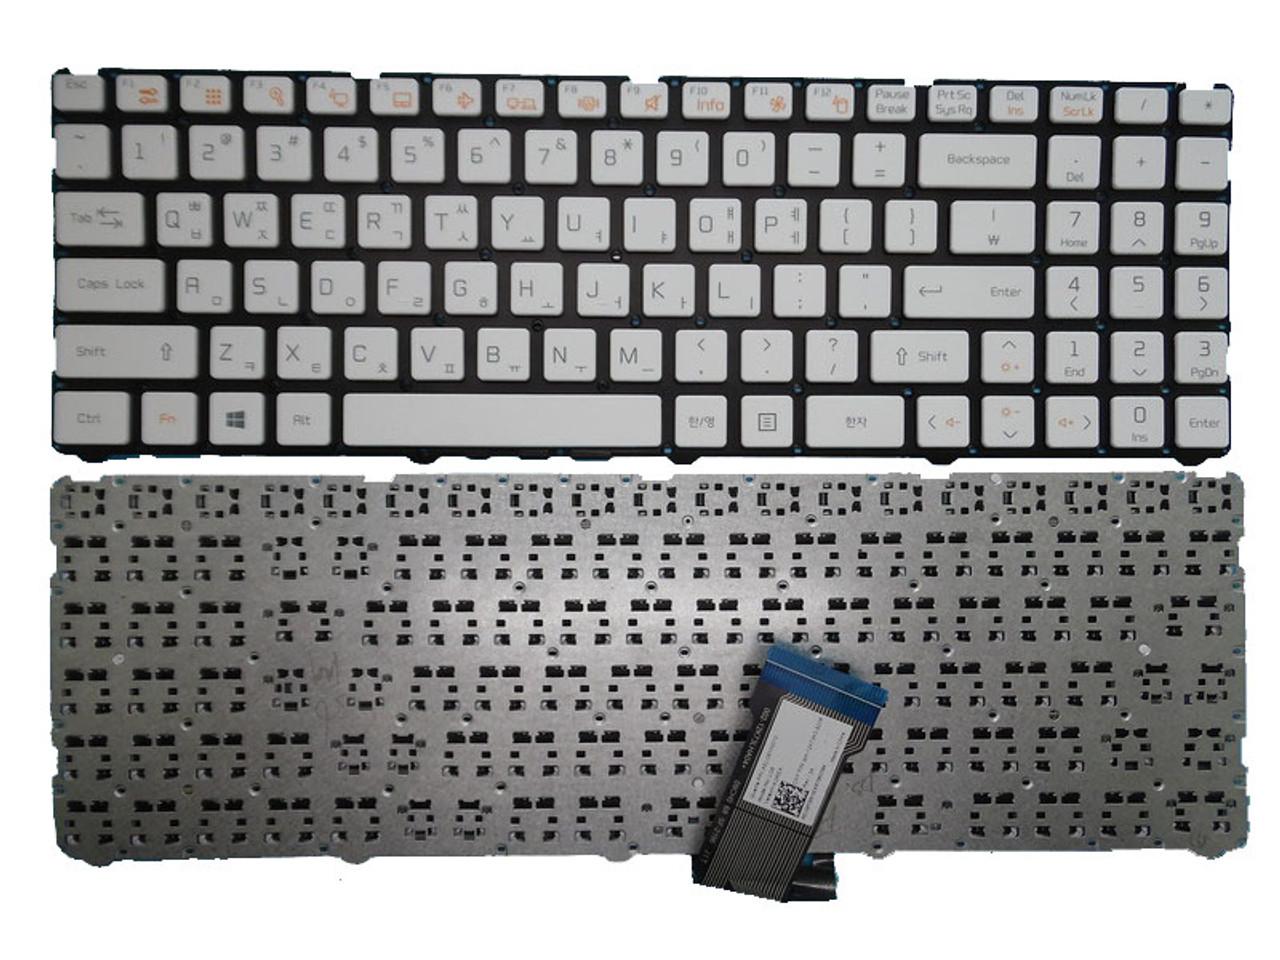 Laptop Keyboard for Quanta LG9 LG9A LG9C LG9CA Korea KR MP-12K73TQ-9207 AELG9A00020 Black Without Frame New